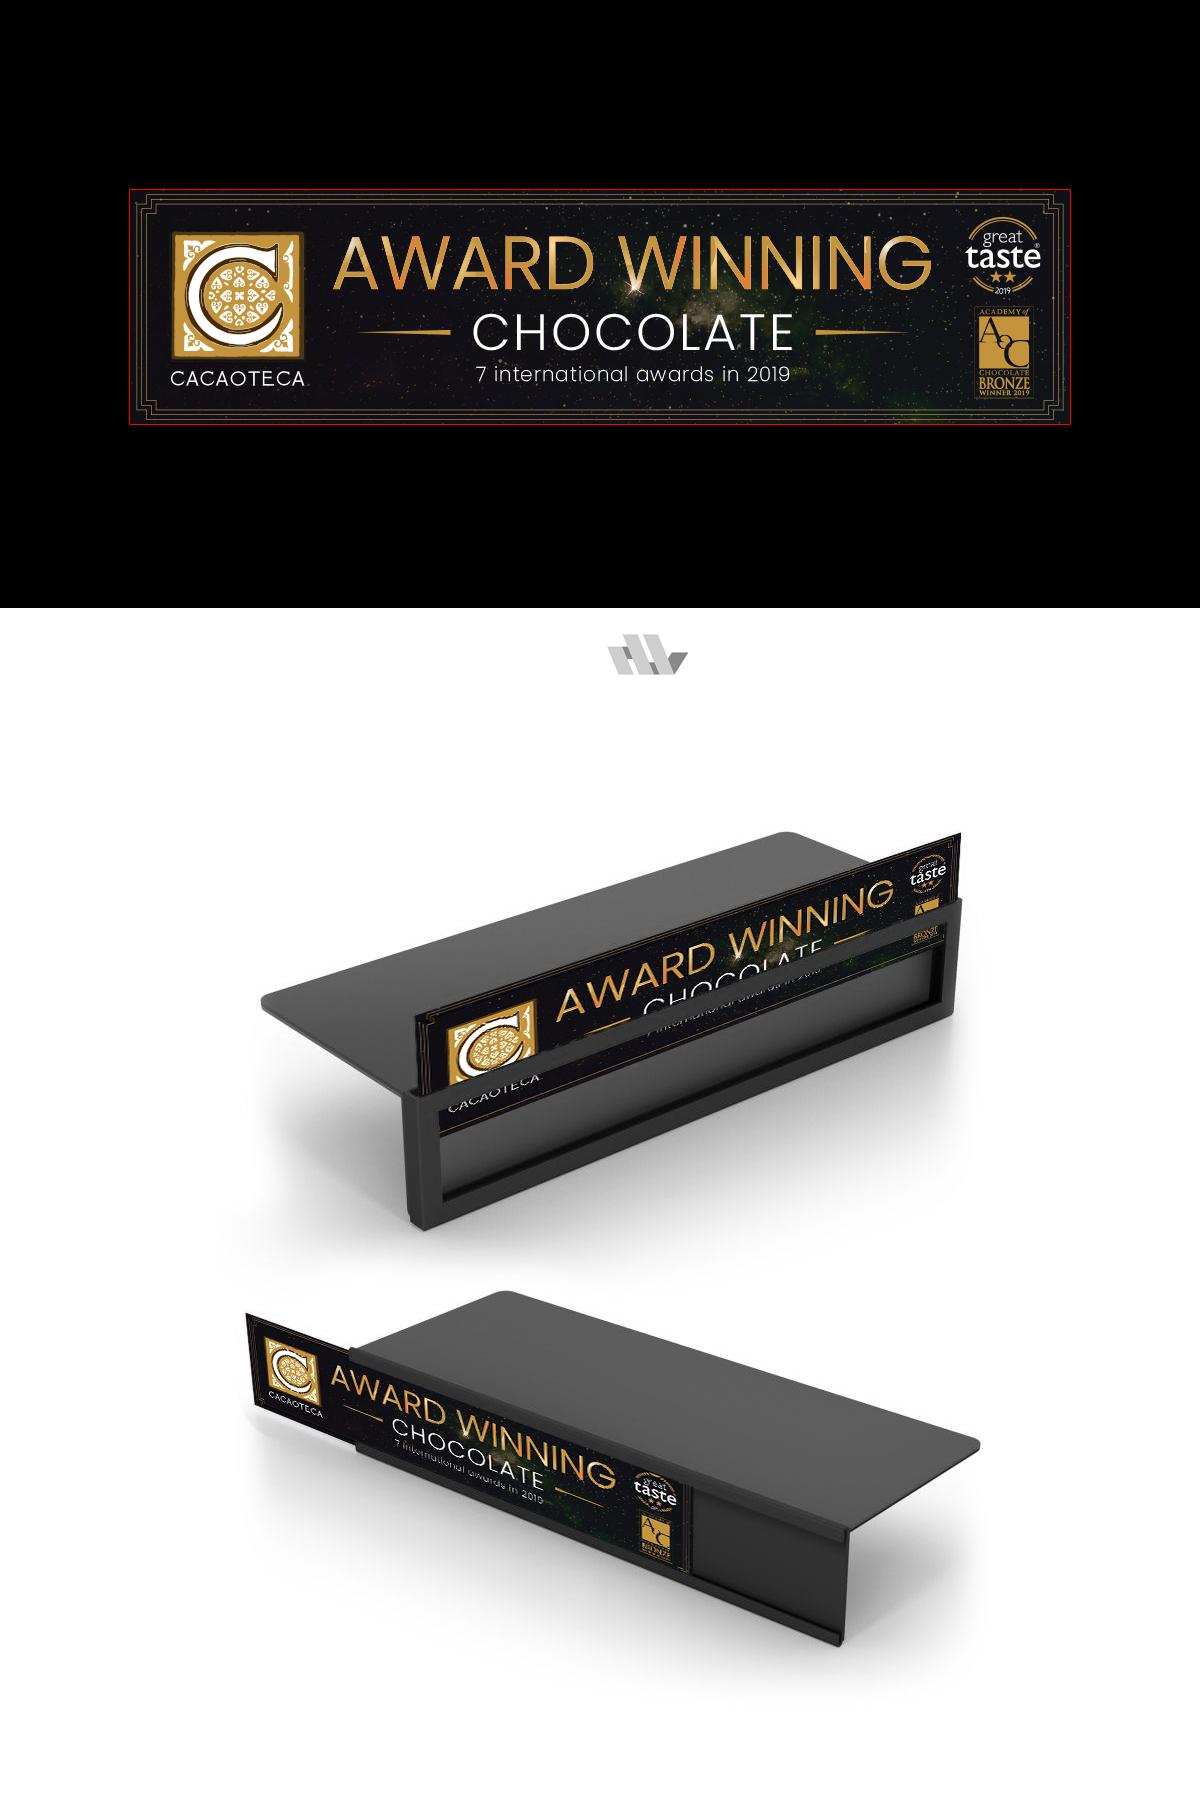 Award Winning Chocolate